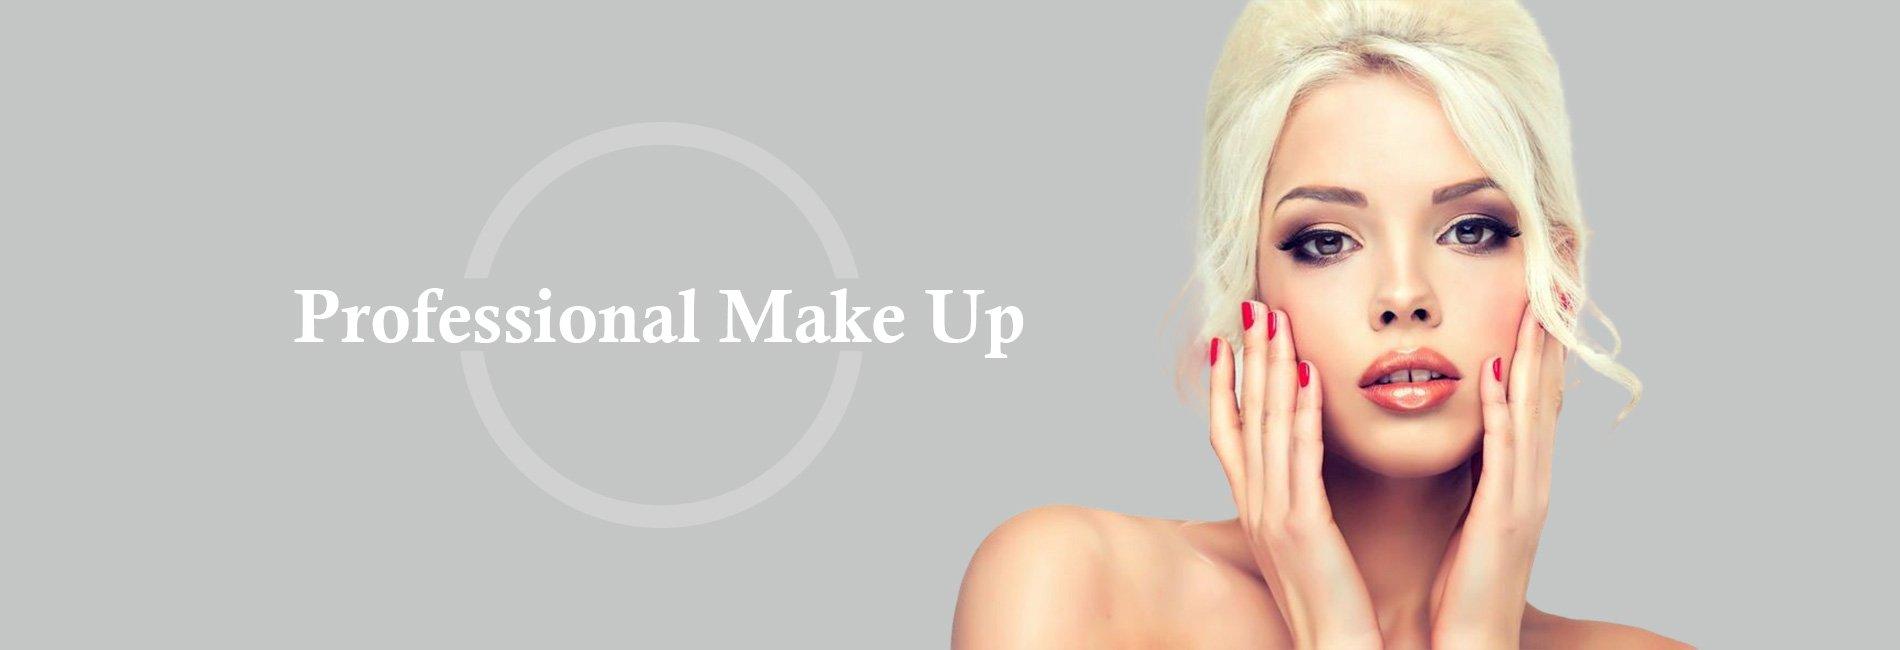 Professional Make Up 2